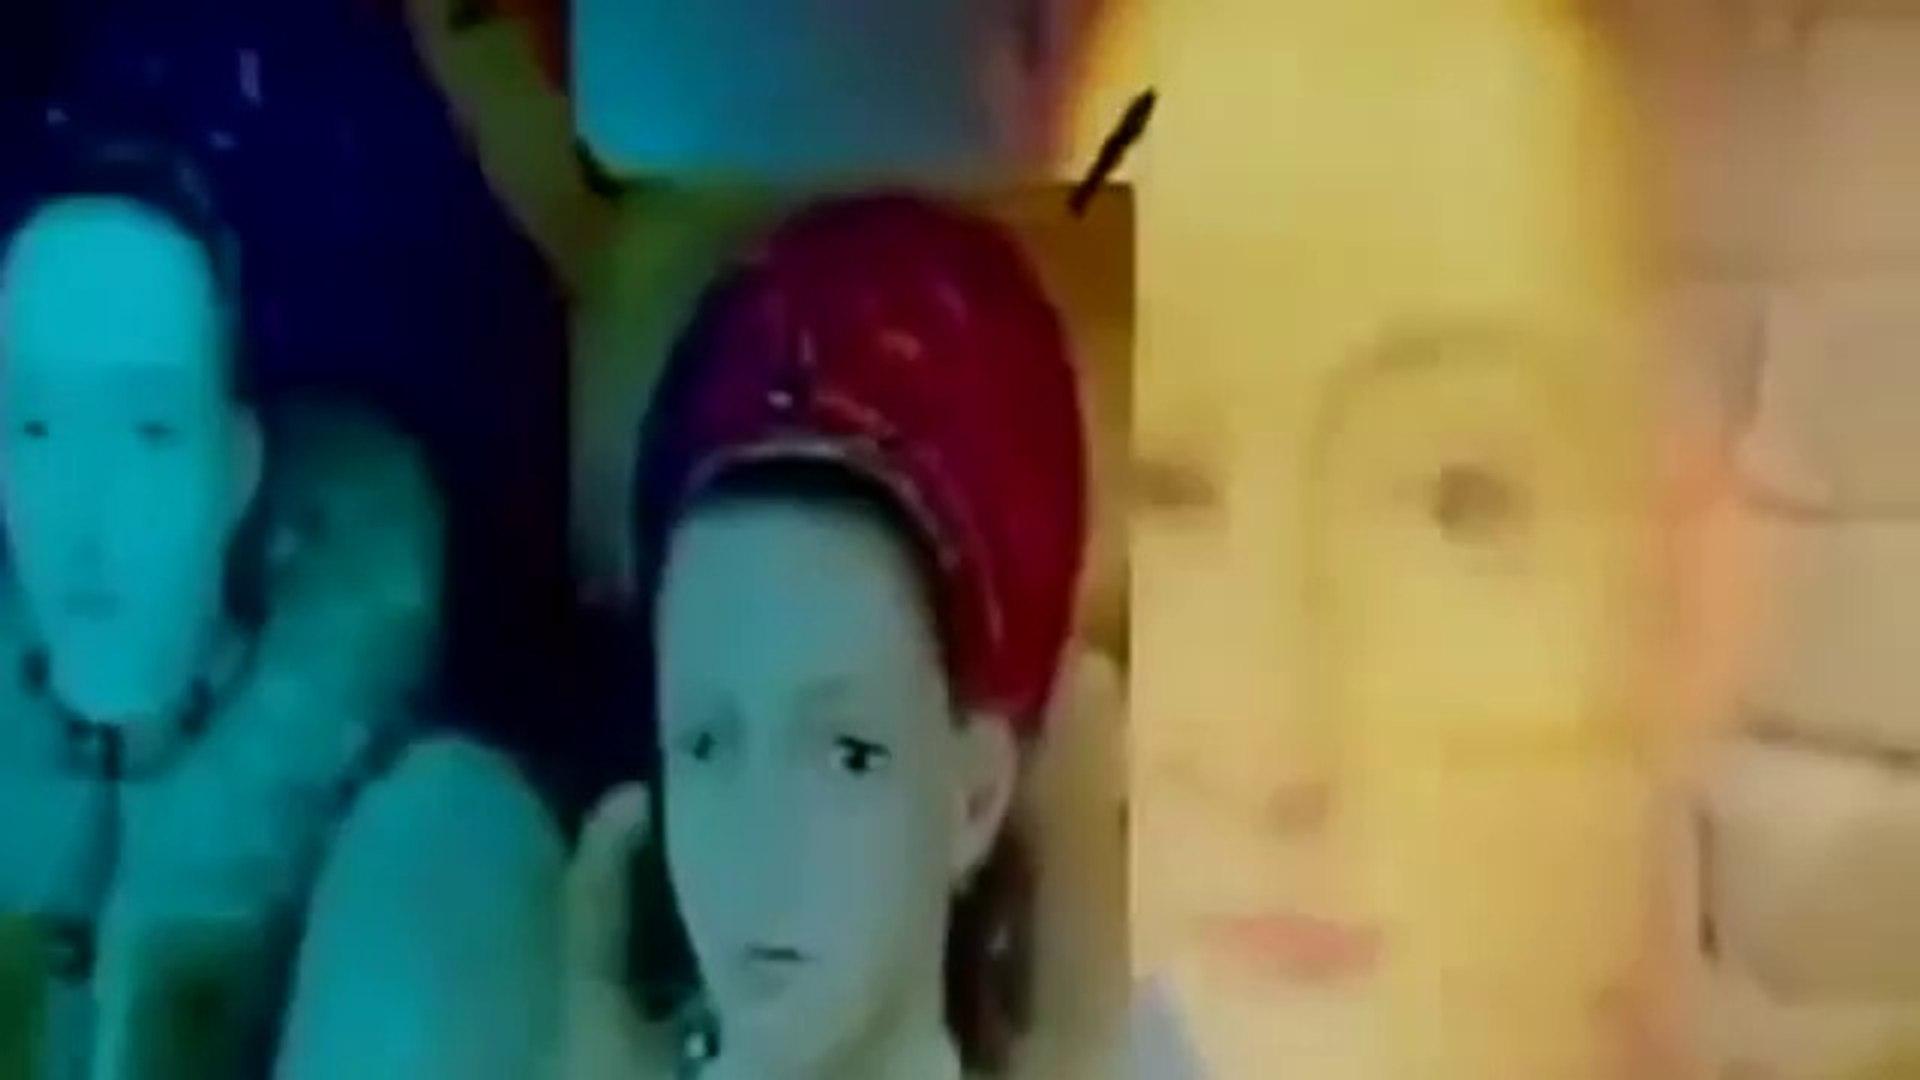 Elizabeth Bathory ; Serial Killer & Torturer (Documentary)